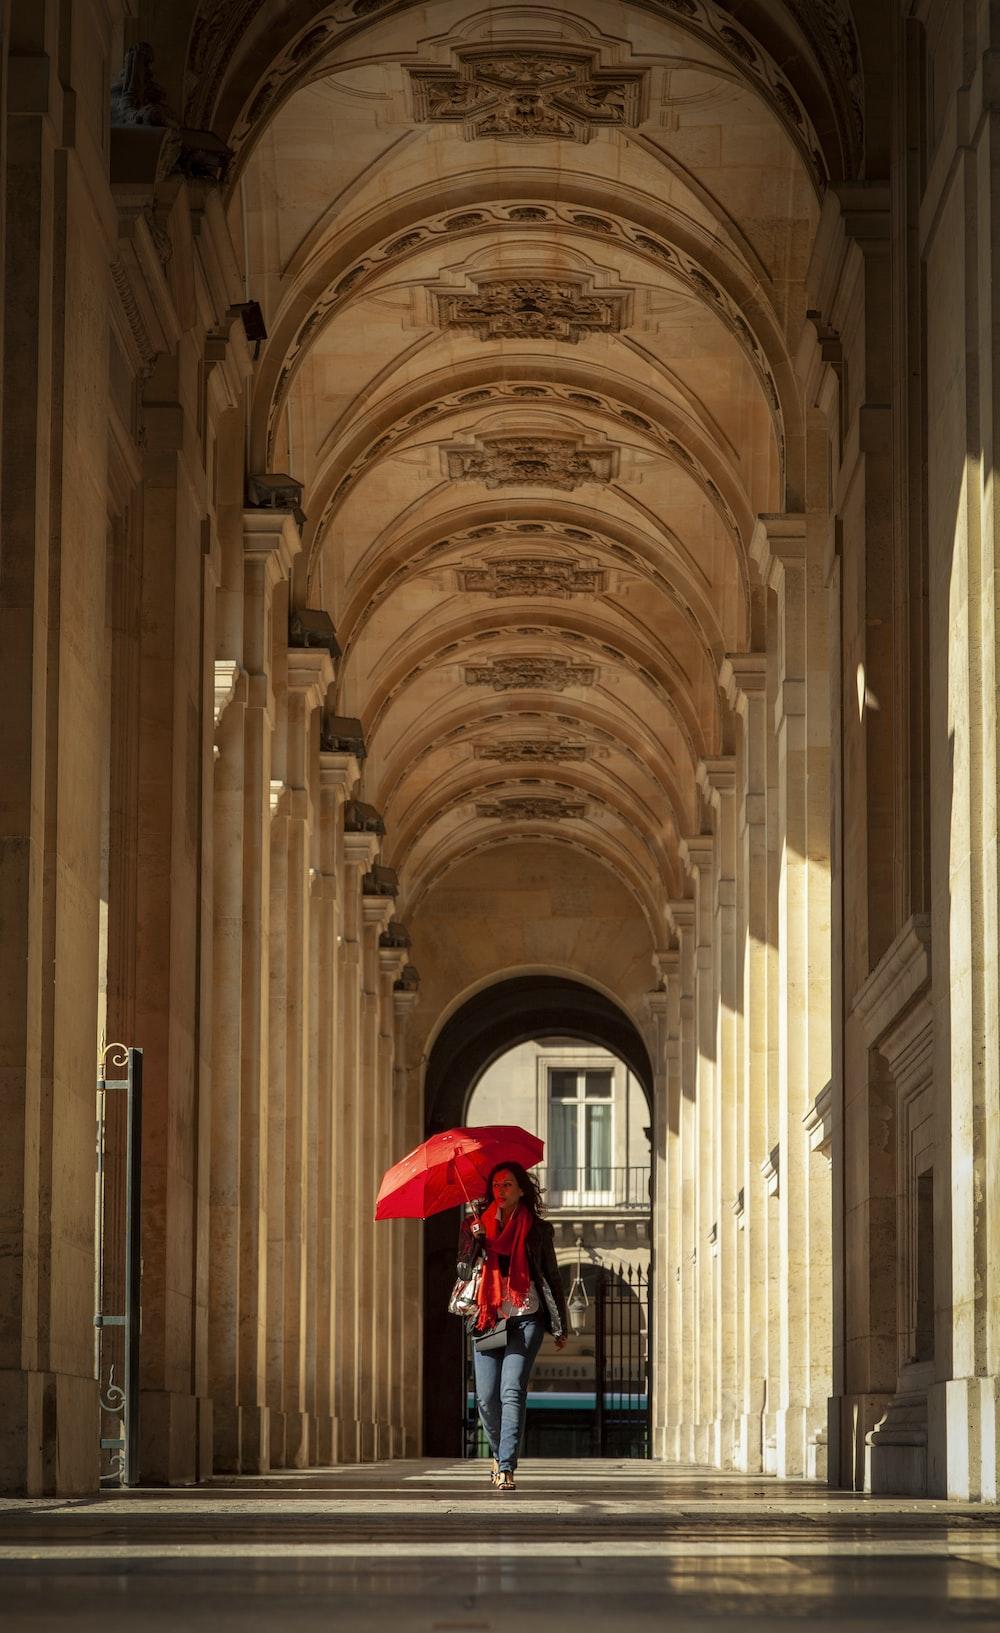 walking holding umbrella walking on building corridor